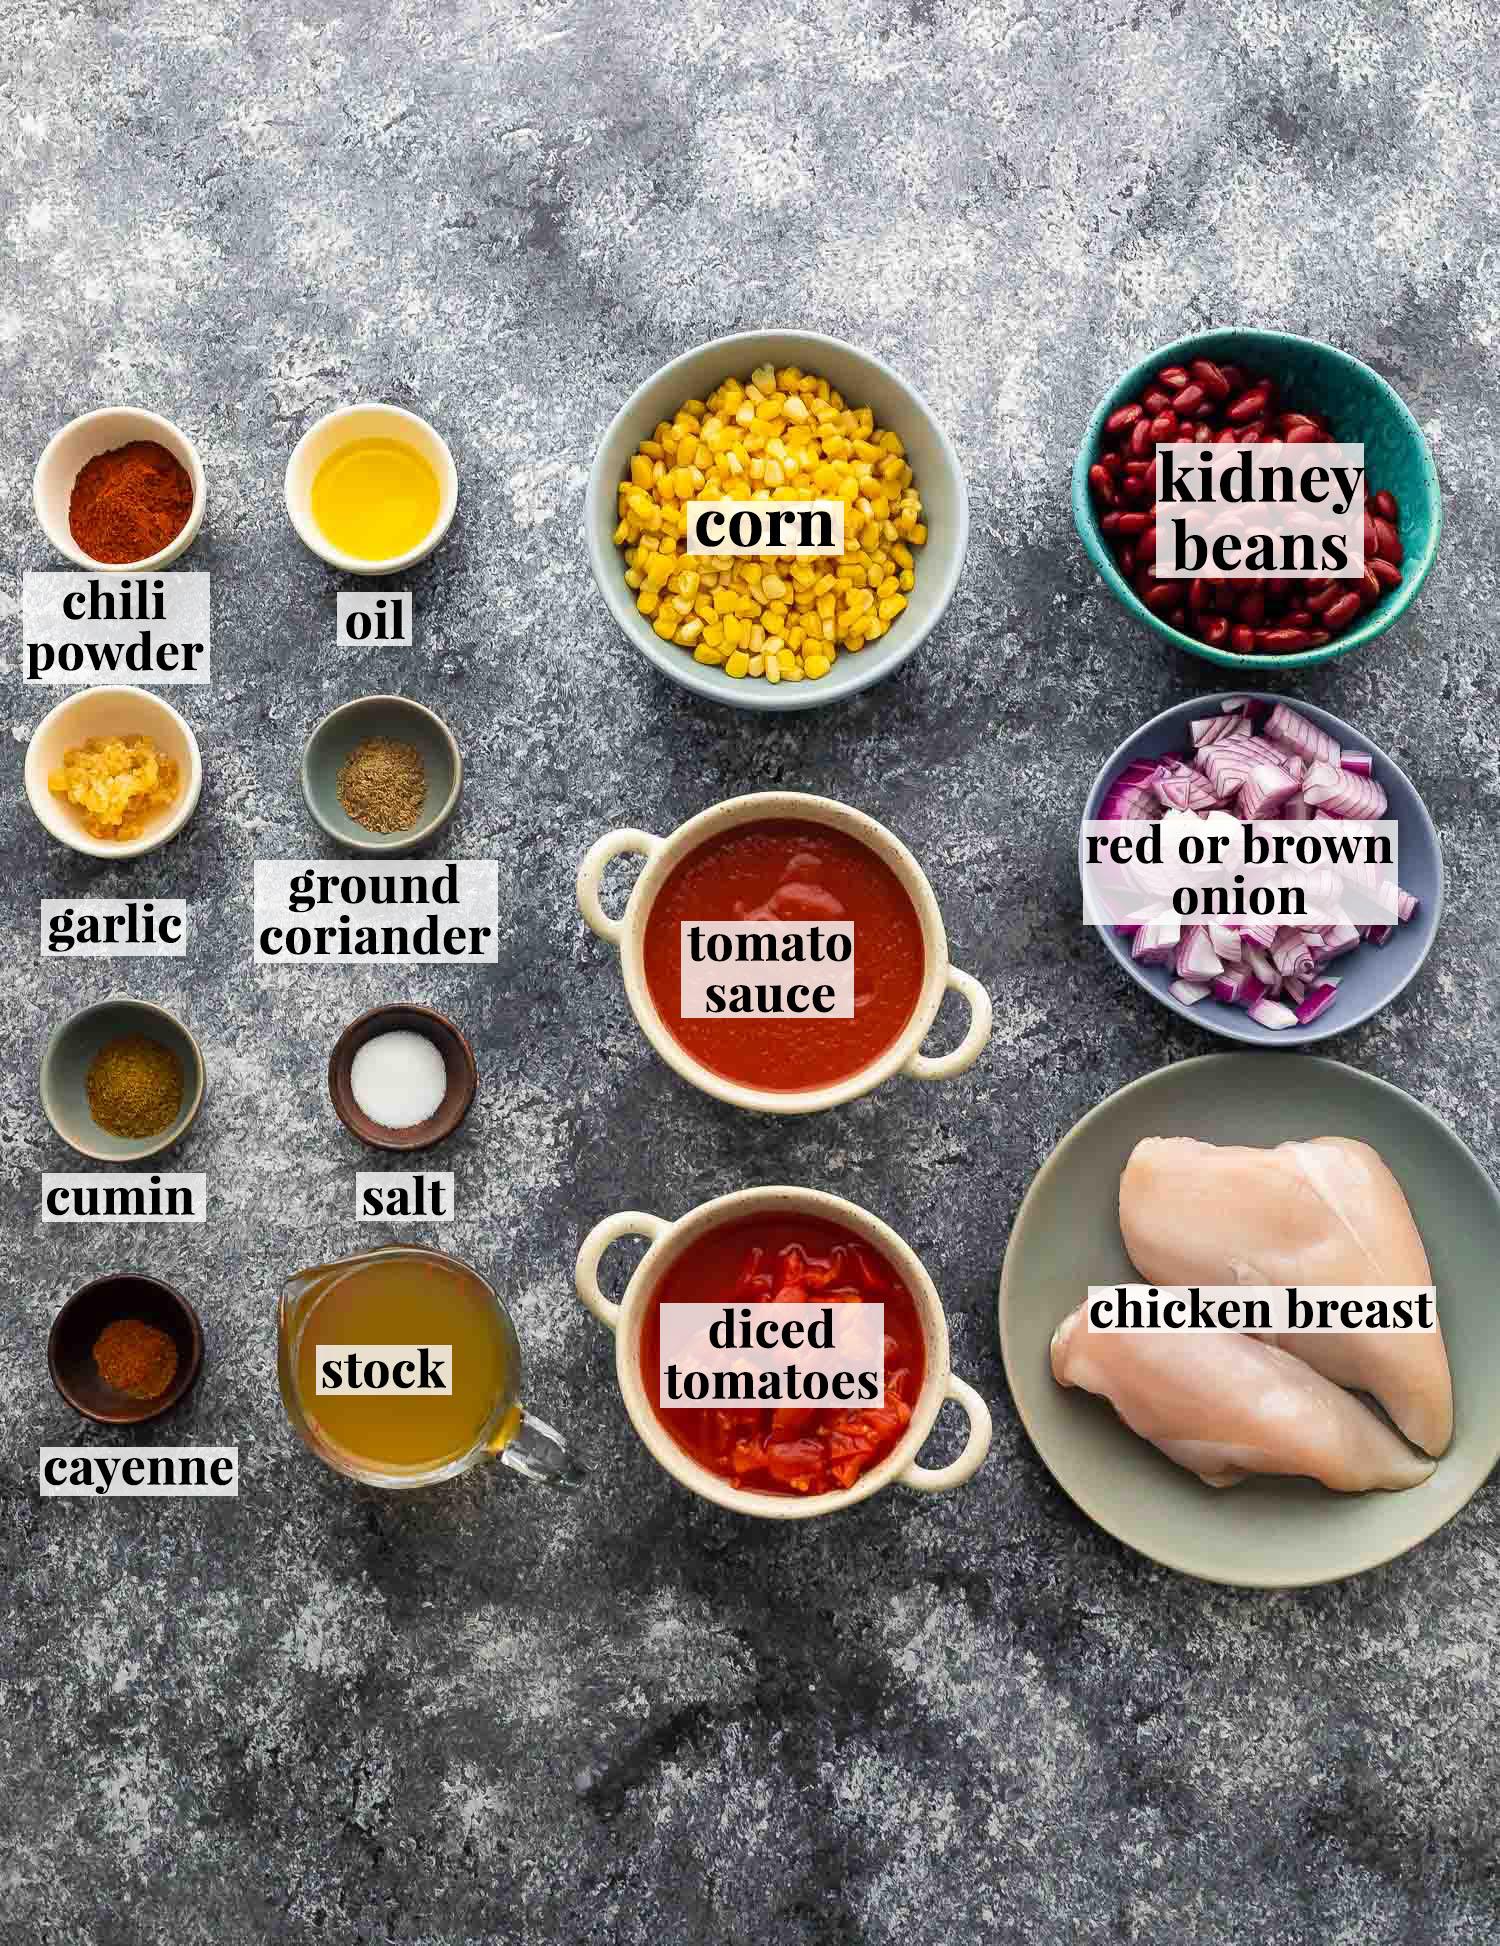 ingredients required to make chicken chili